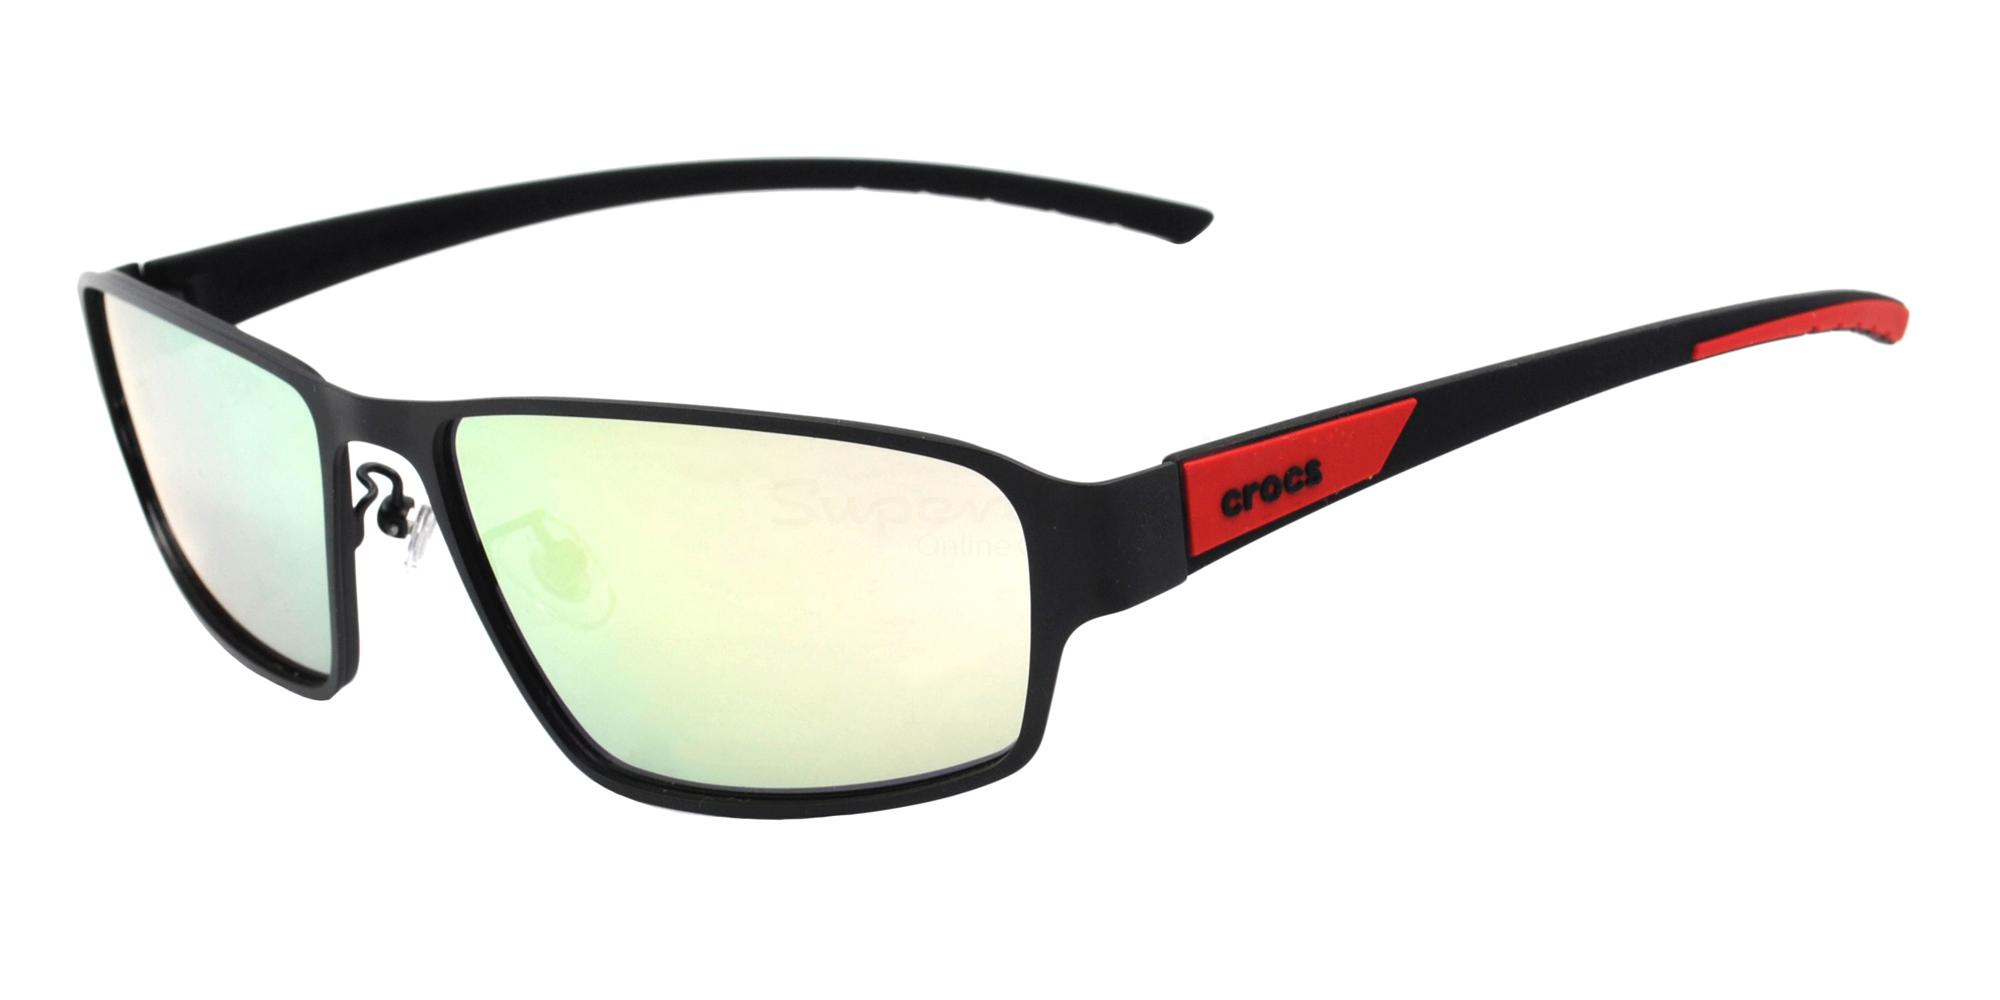 20BK CS053 Sunglasses, Crocs Eyewear